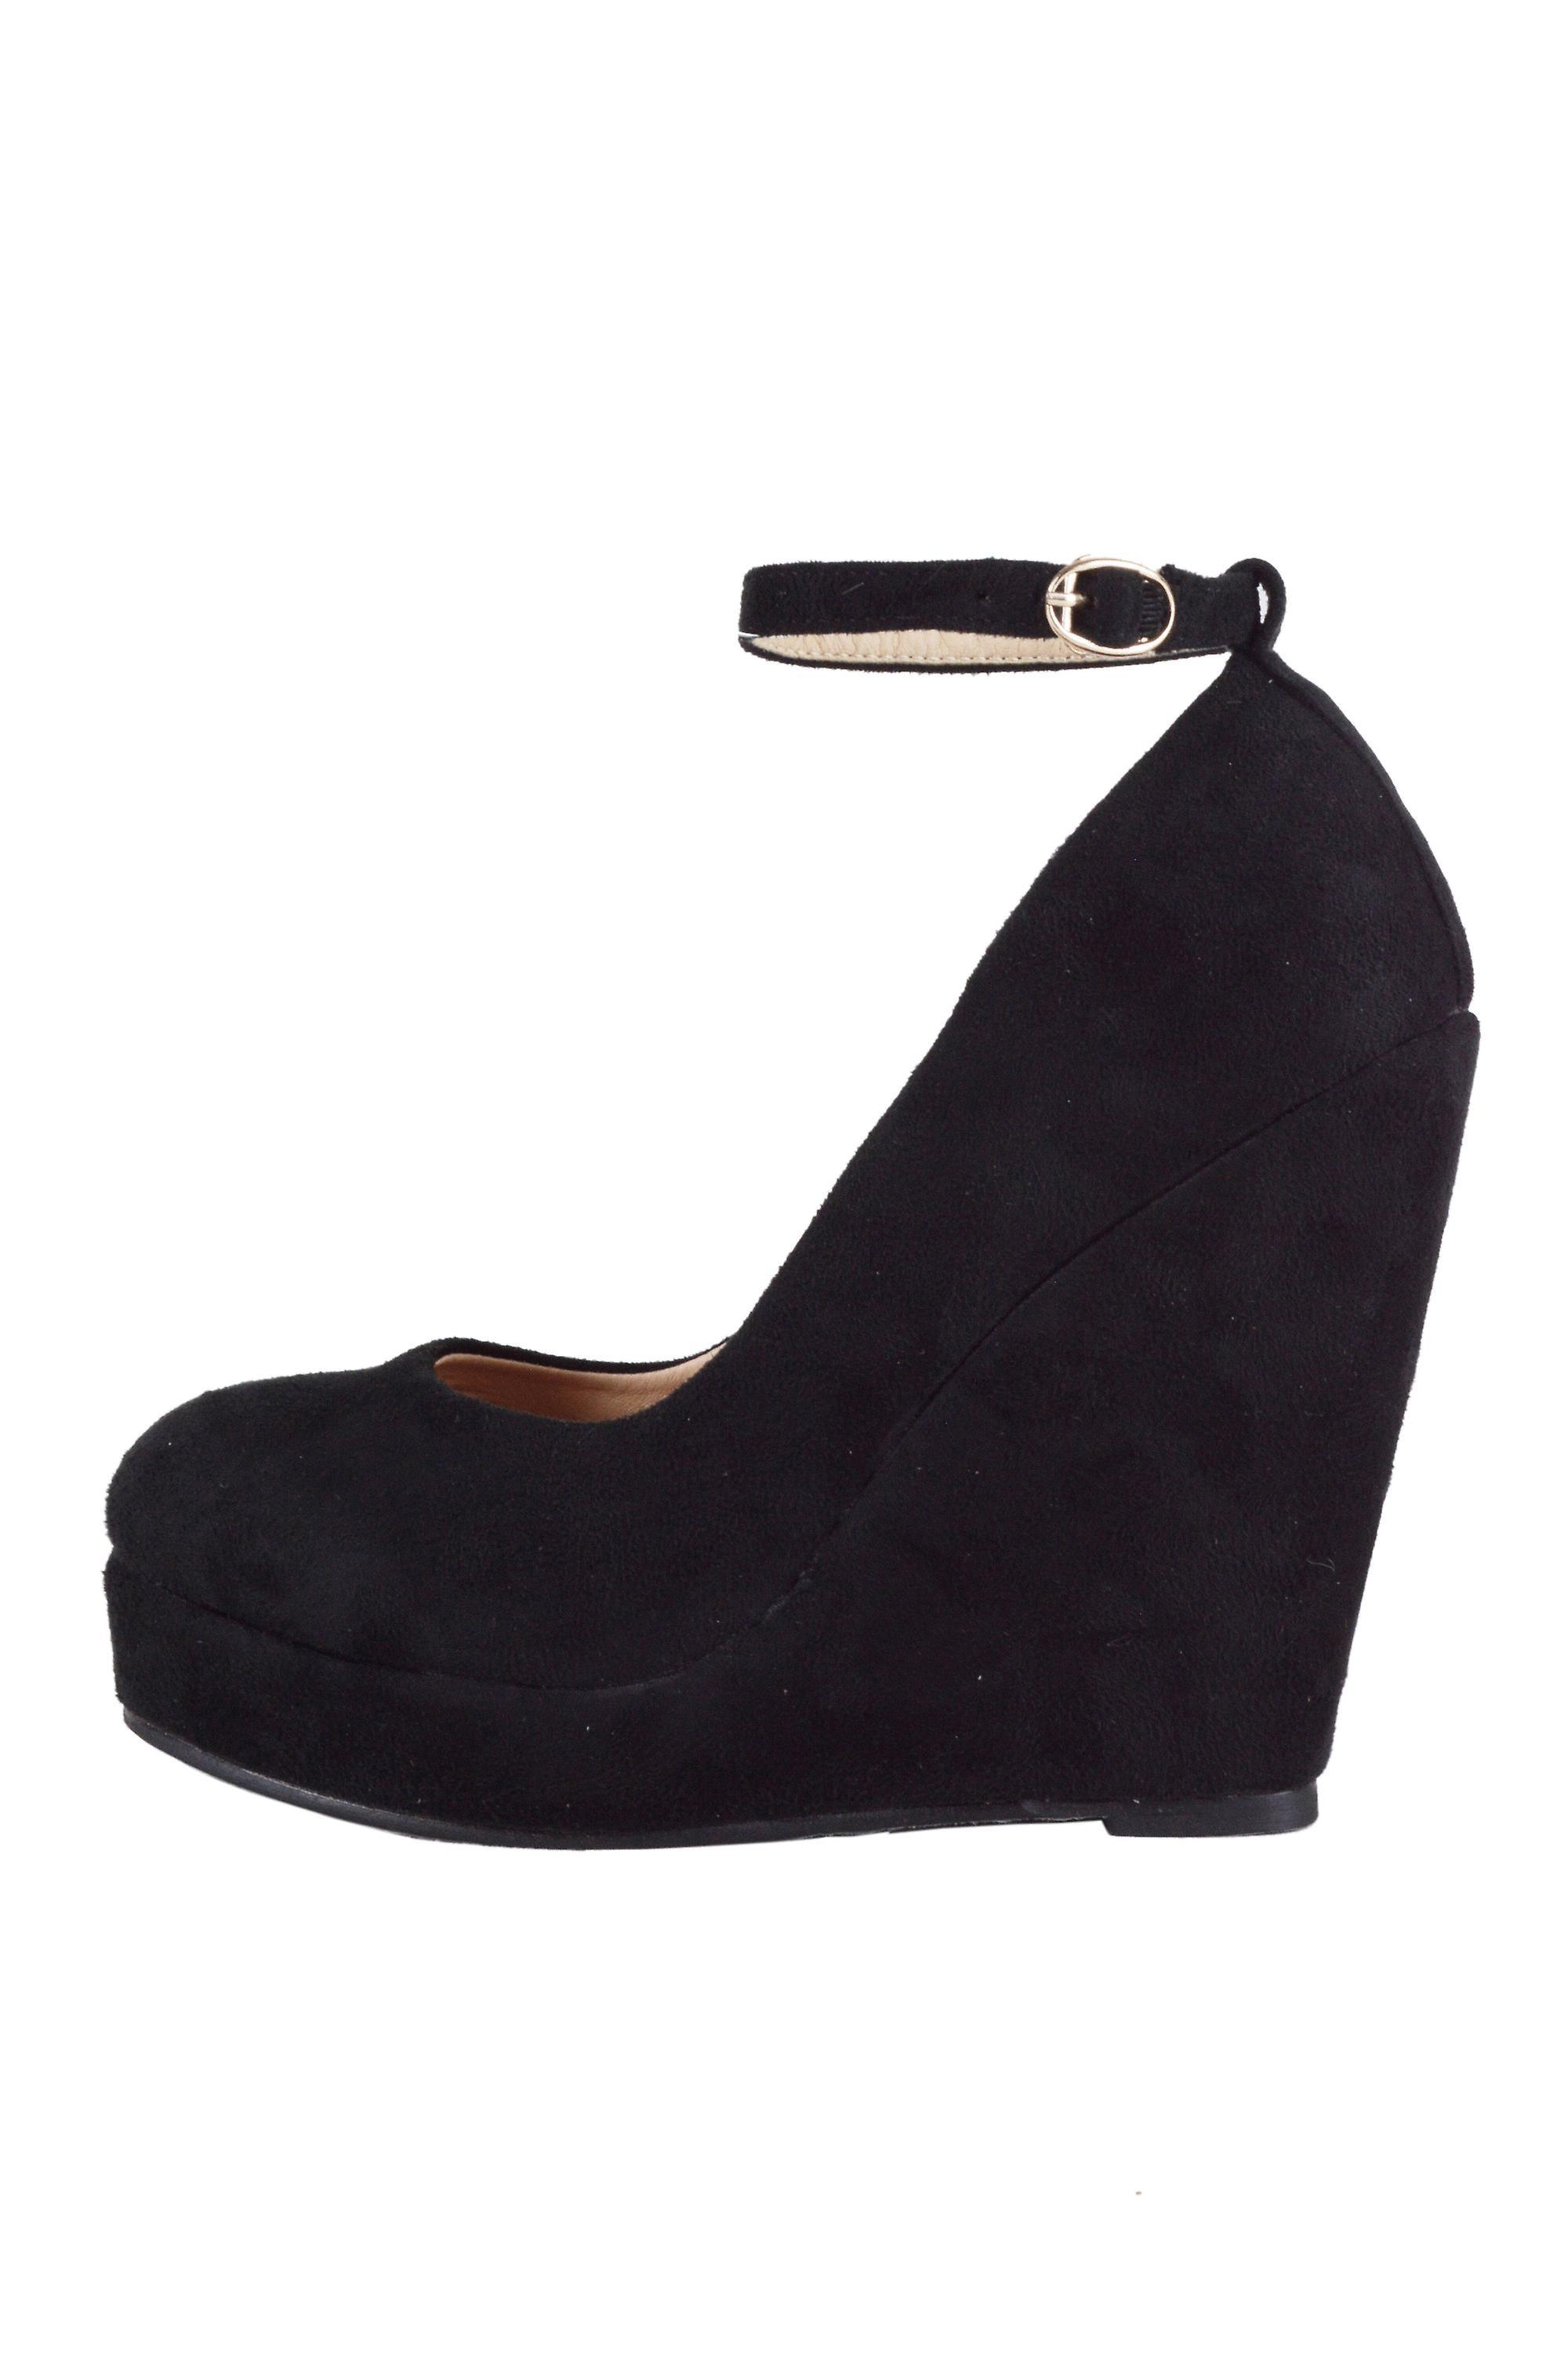 b21c0b6e LMS Black Suede Round Toe Court Shoe With Wedge Heel   Fruugo